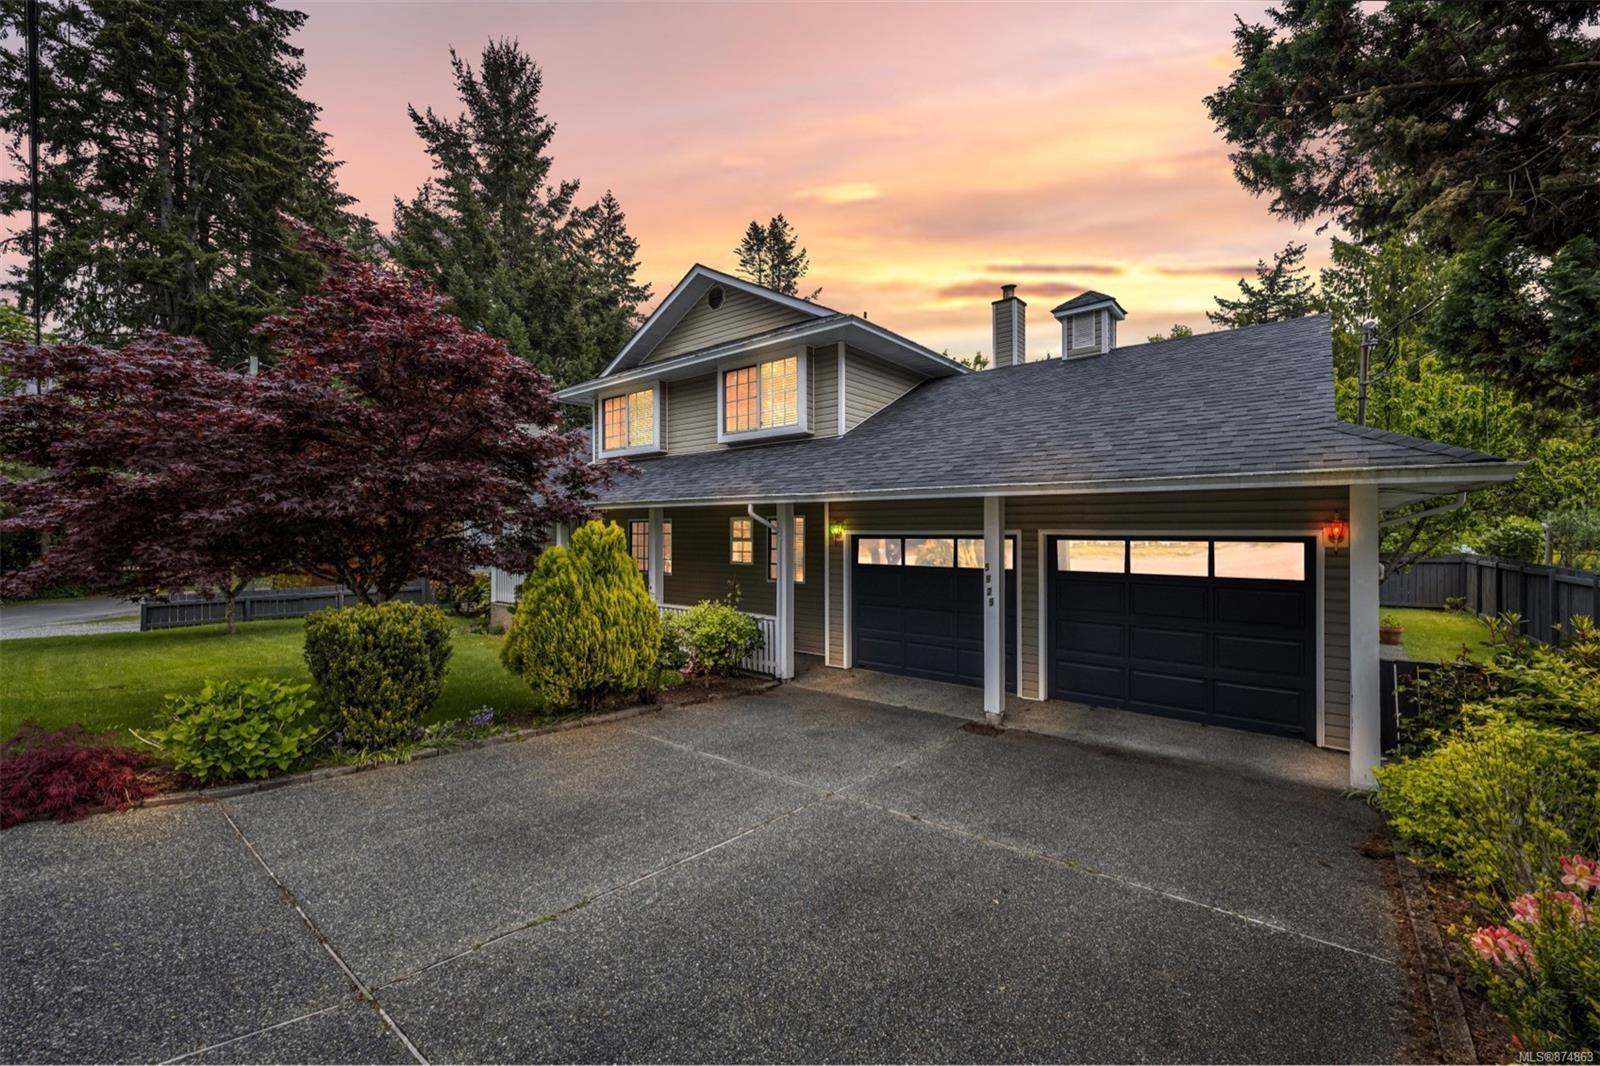 Main Photo: 5925 Highland Ave in : Du West Duncan House for sale (Duncan)  : MLS®# 874863